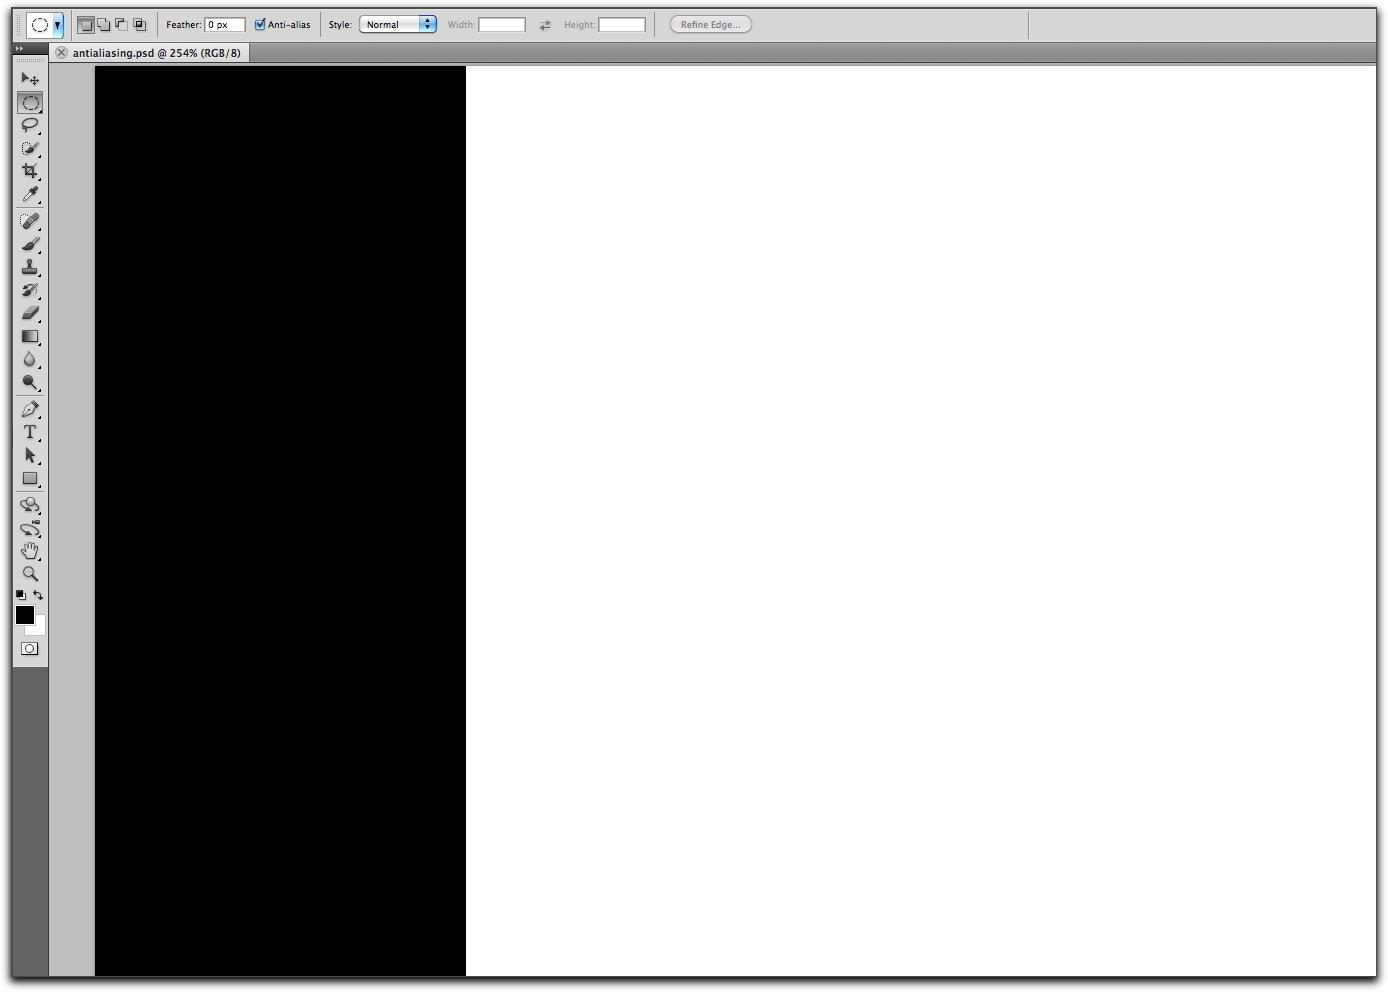 Adobe Photoshop: Original Image